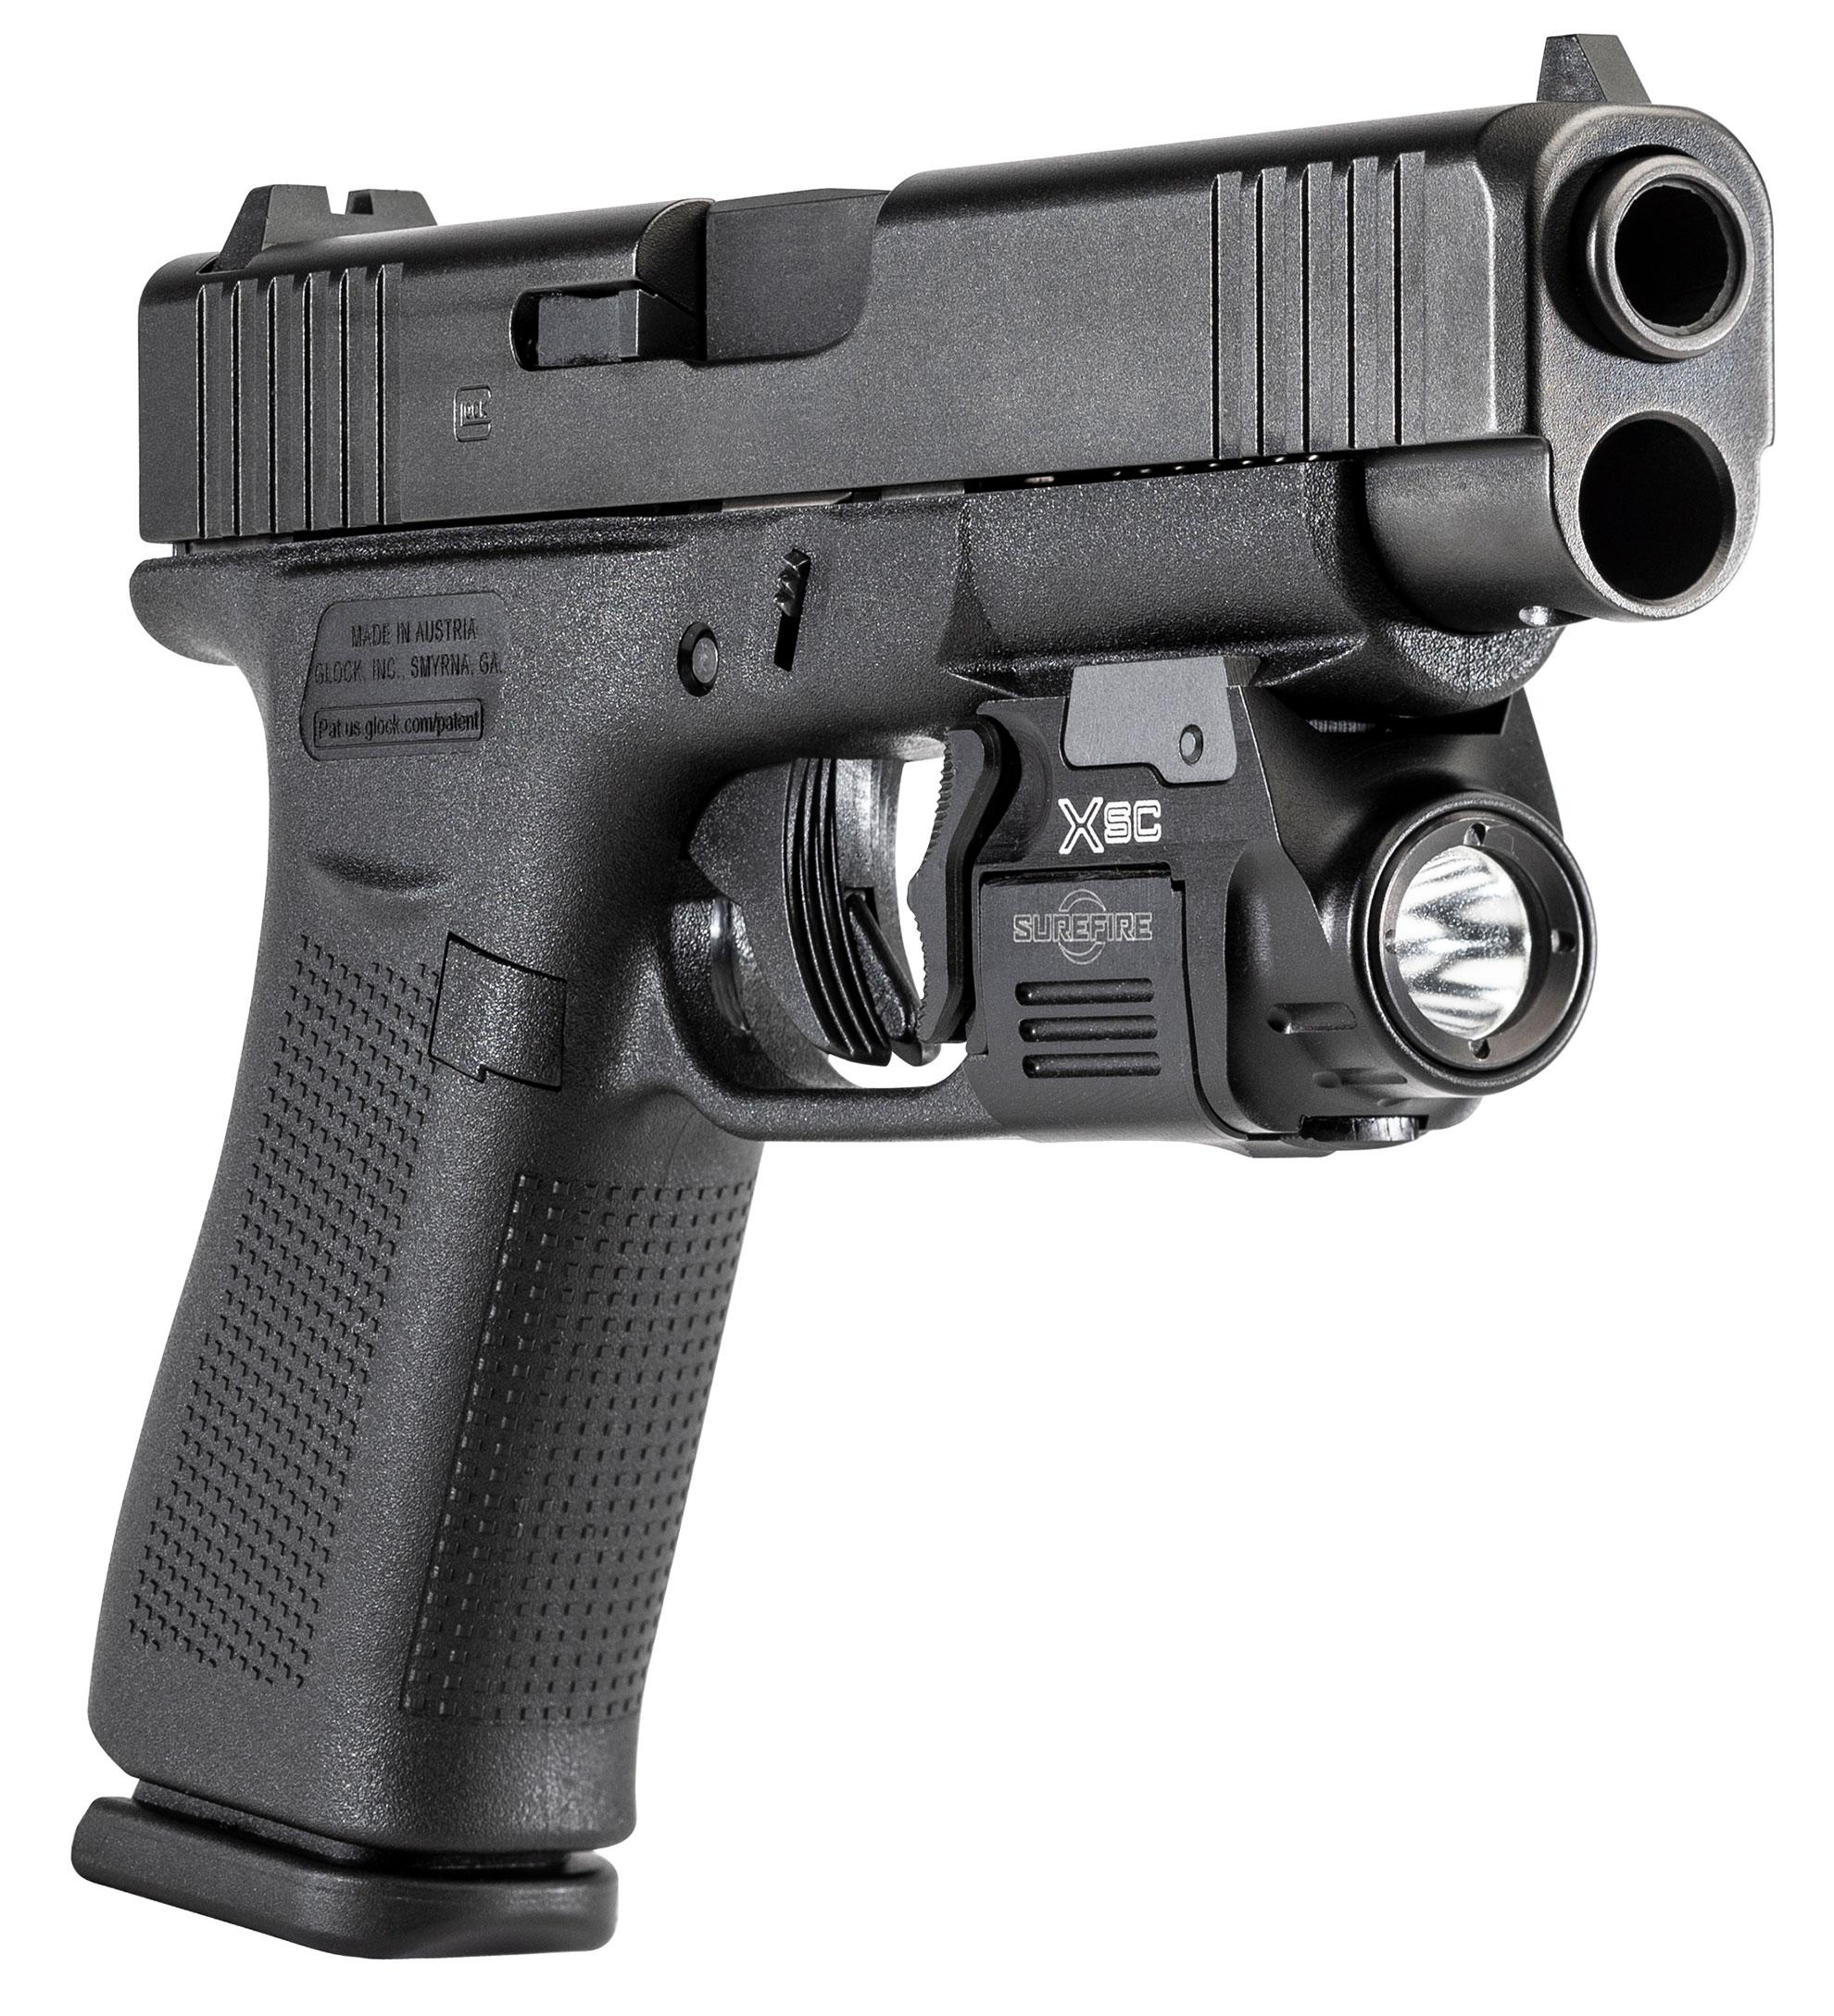 SureFire XSC micro-compact WeaponLight